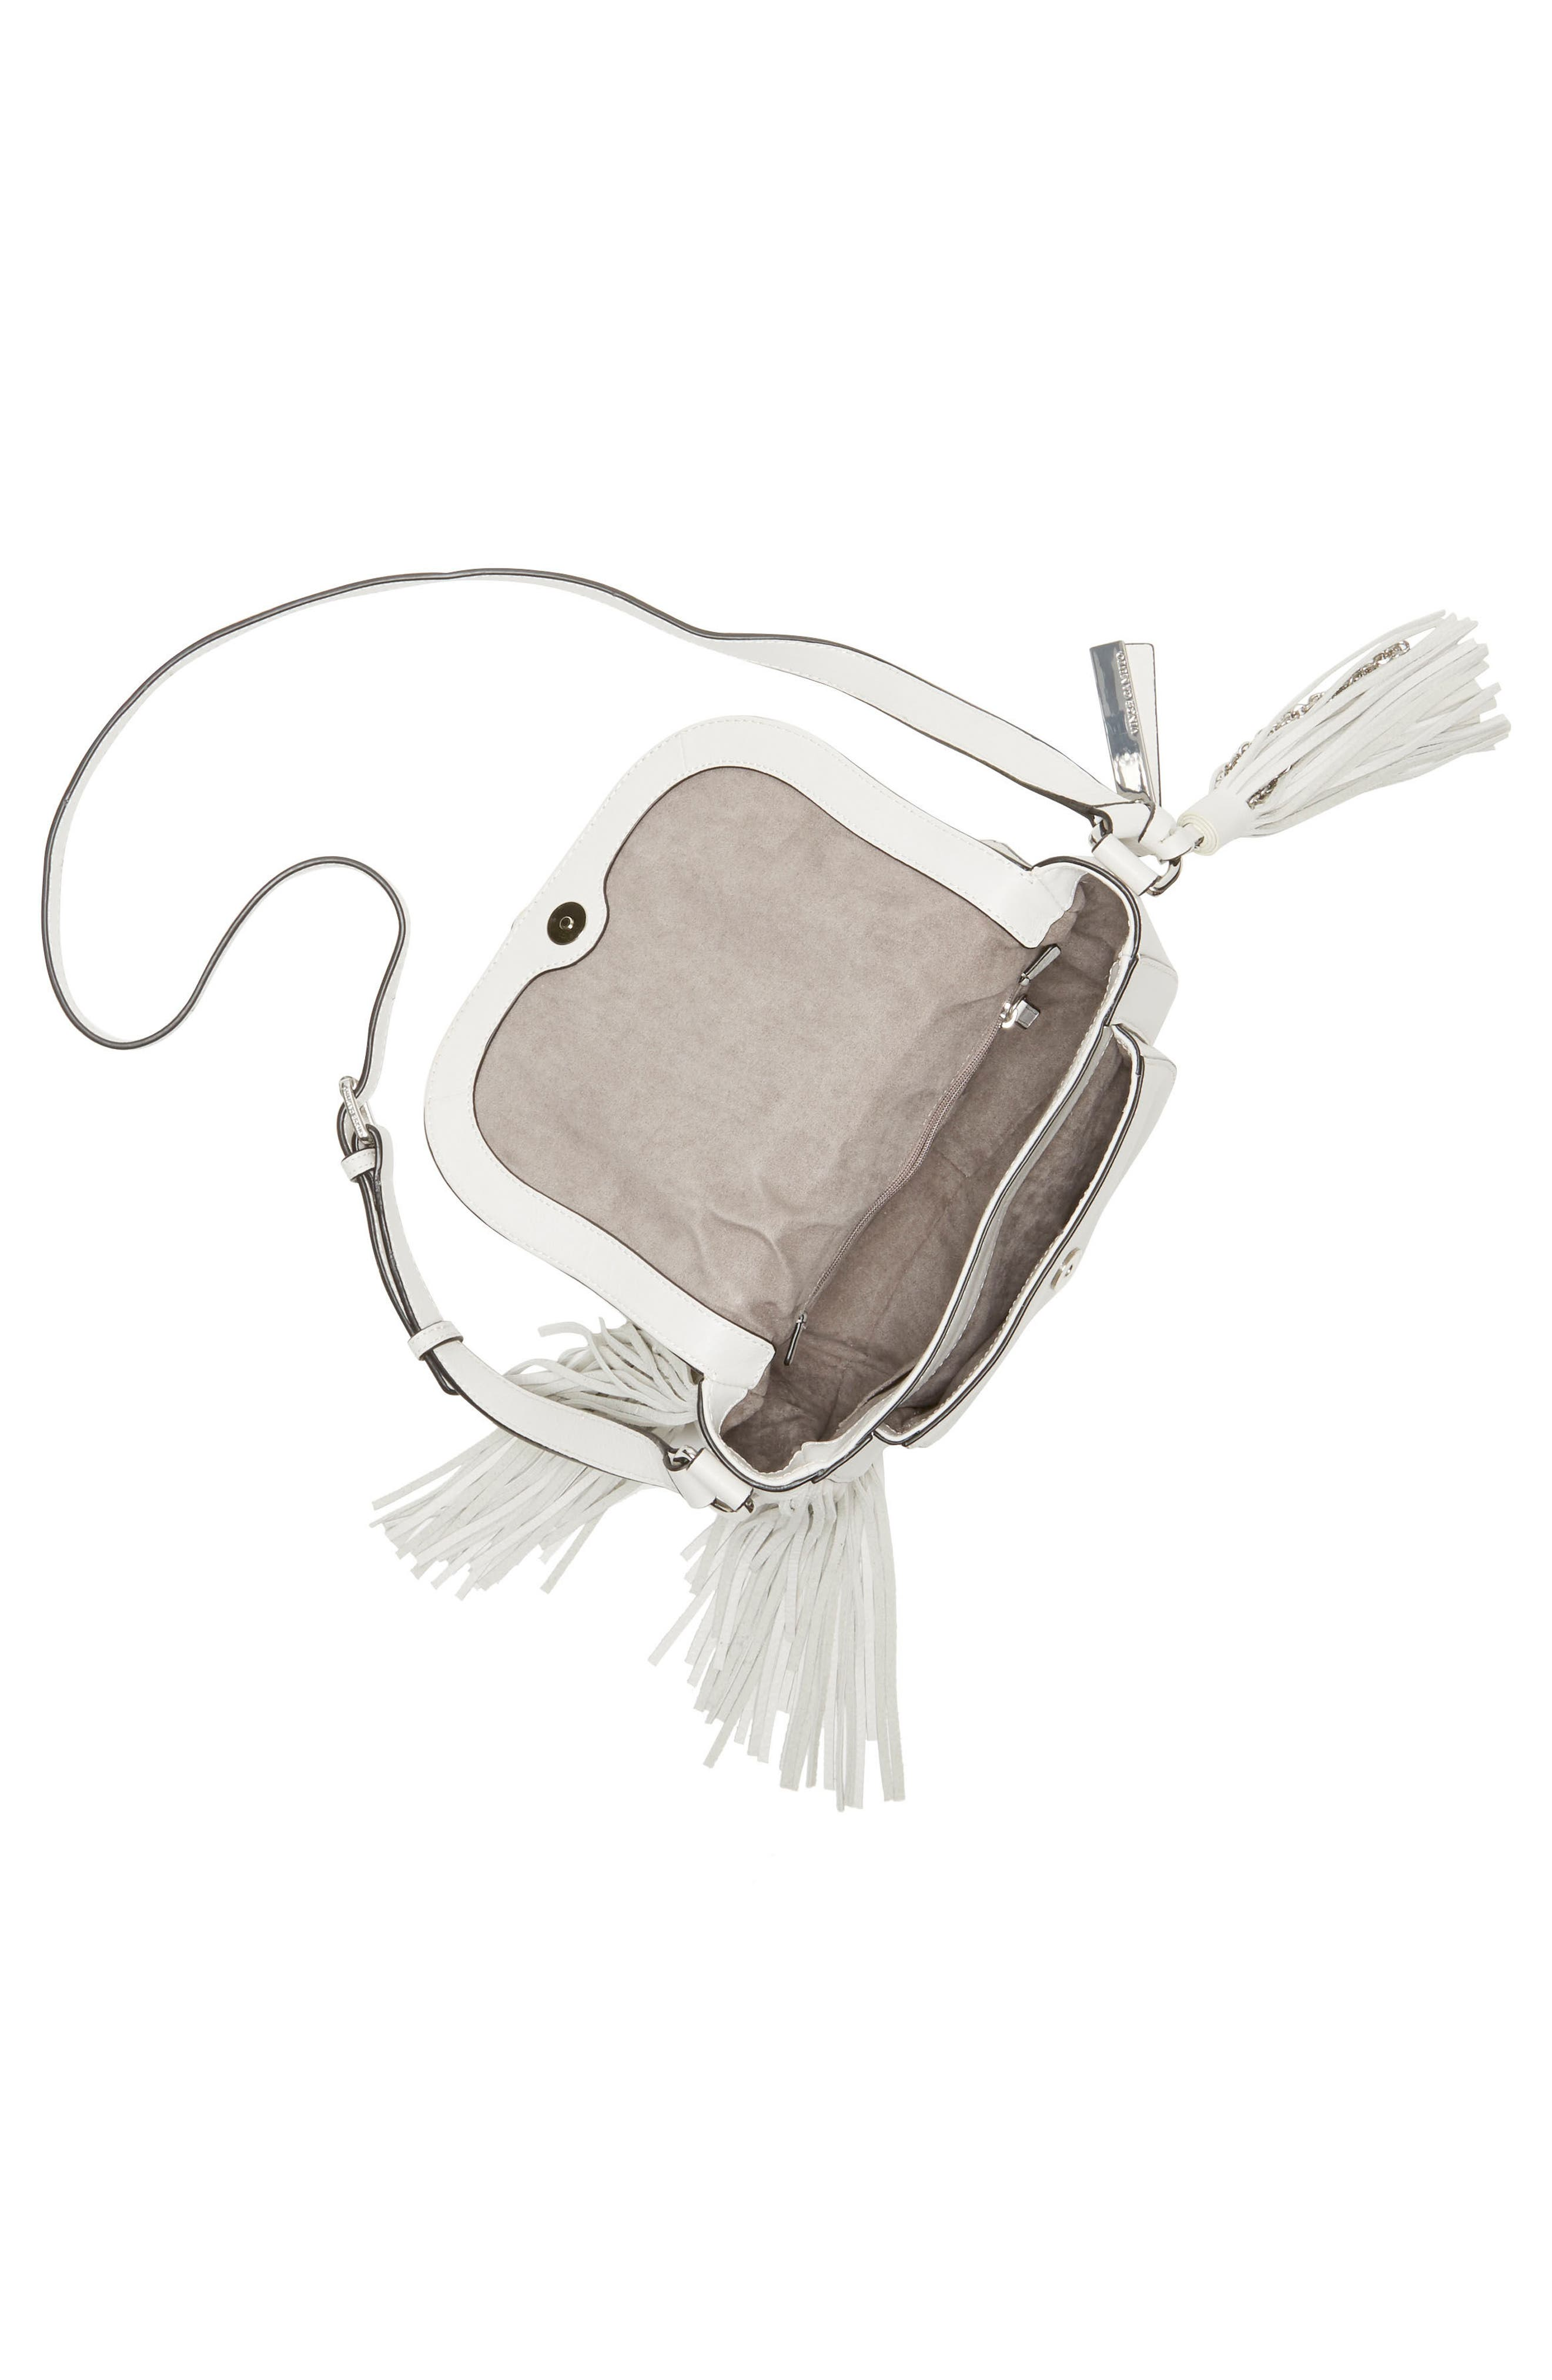 Hil Leather Crossbody Bag,                             Alternate thumbnail 3, color,                             Vaporous Grey